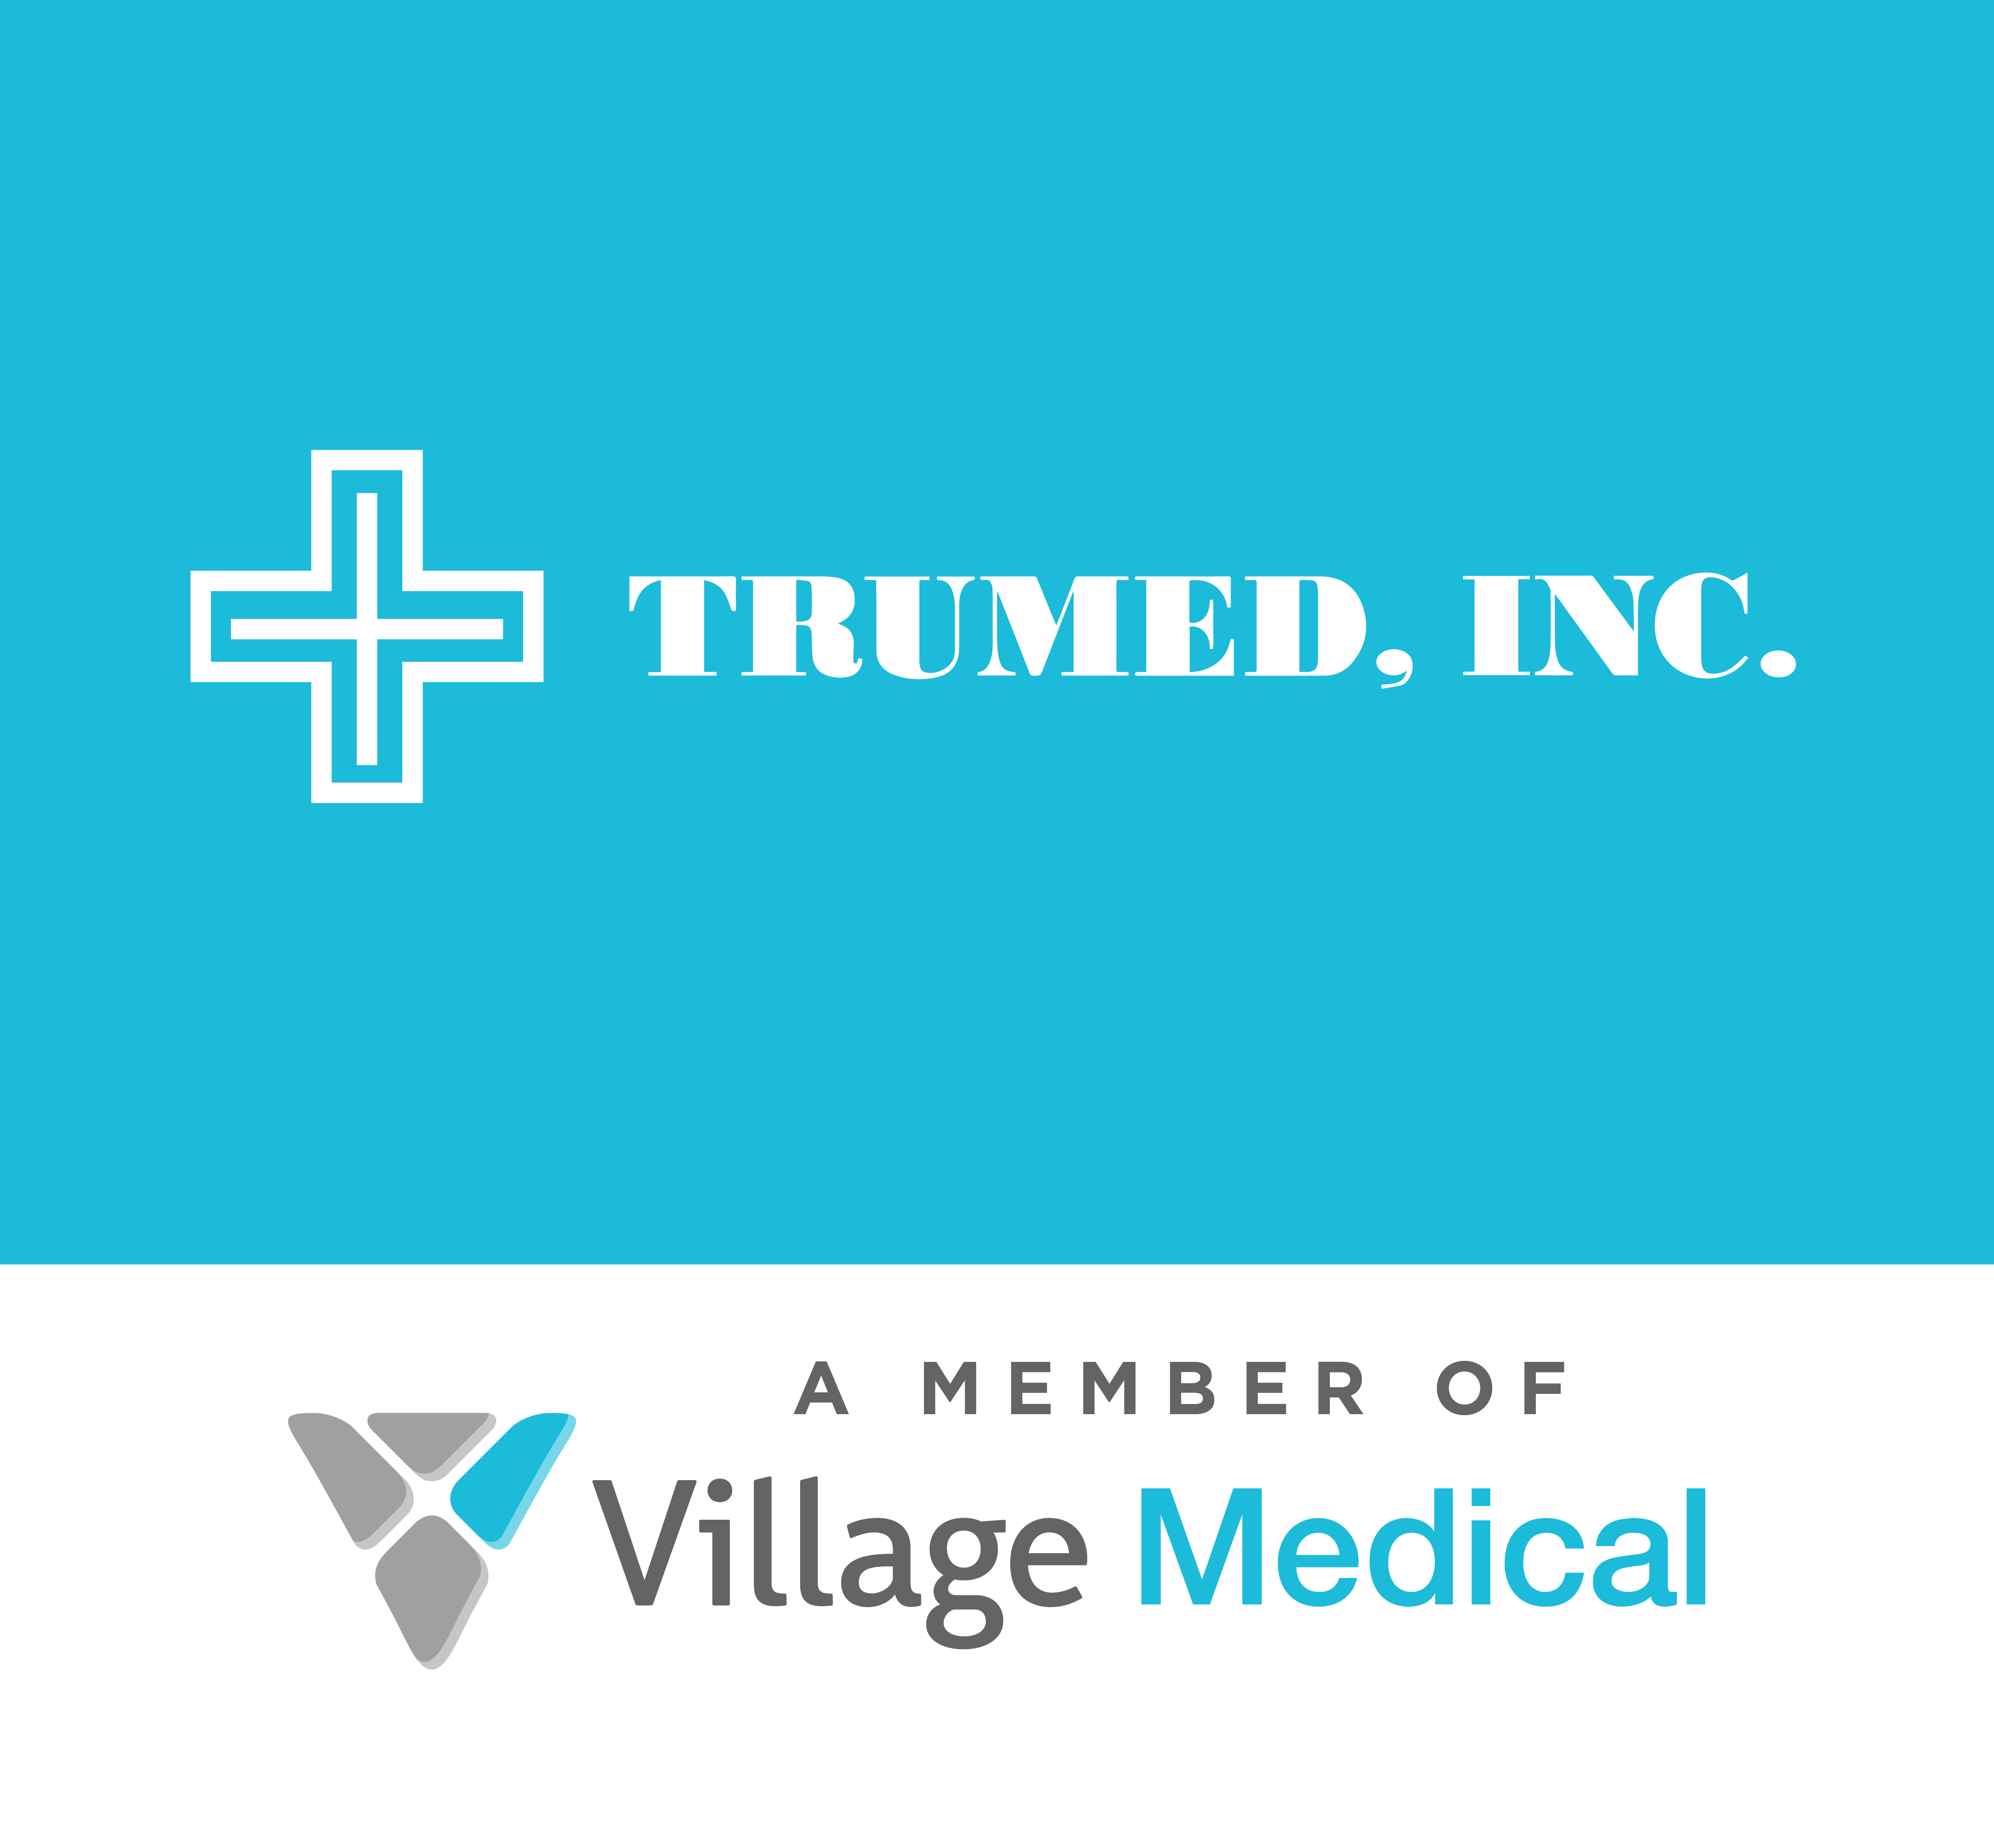 Village Medical - 528 Newton Street  Fall River, MA 02721